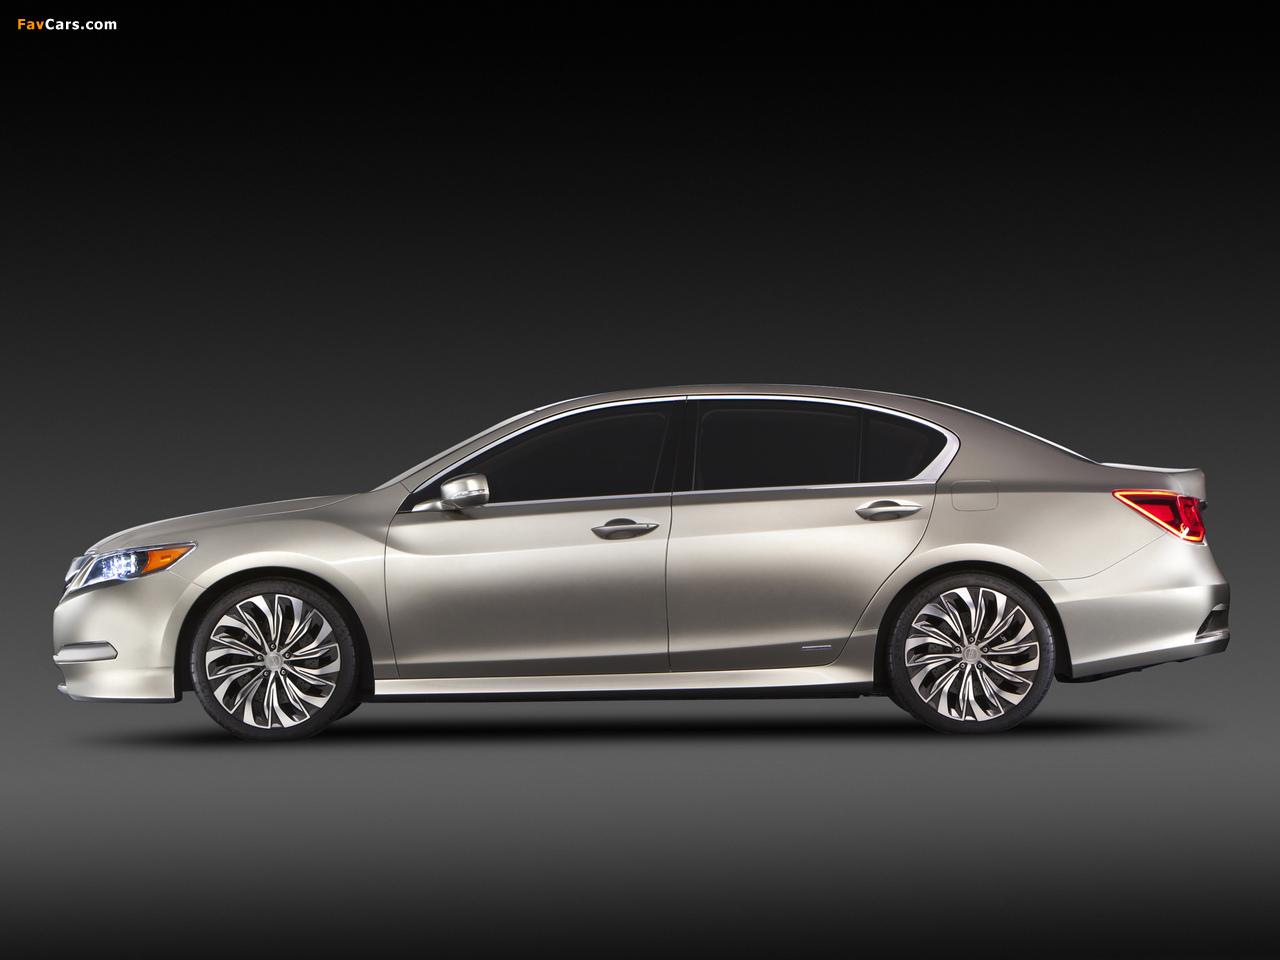 Acura RLX Concept (2012) pictures (1280 x 960)